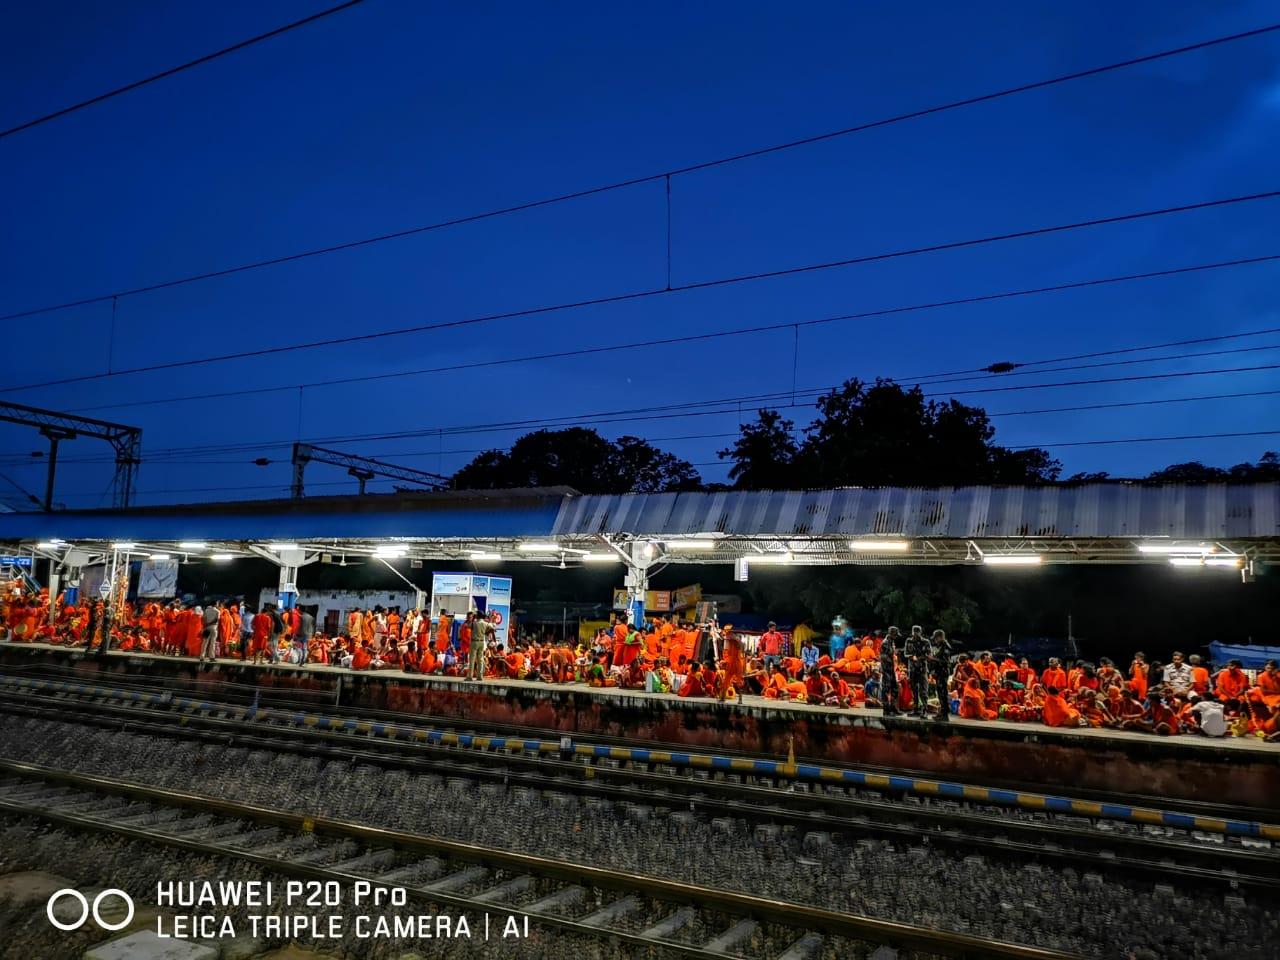 <p>Jasidih railway station platform turns saffron on the occasionof month-long Shravani Mela at Deoghar, Jharkhand.</p>